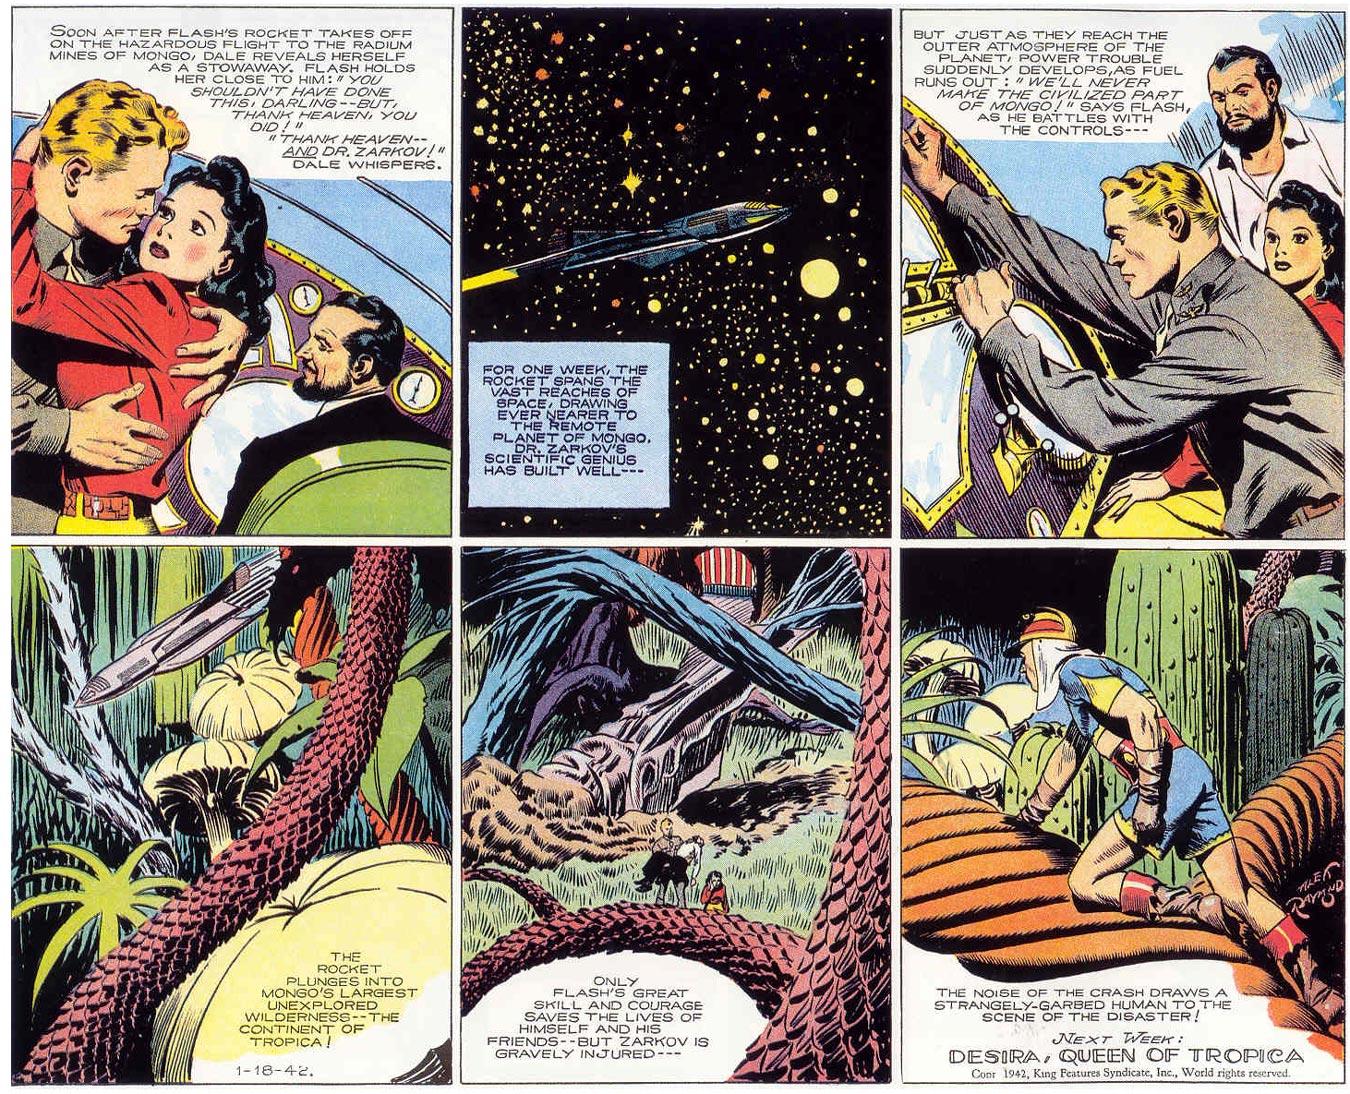 Discussion comic flash gordon strip All